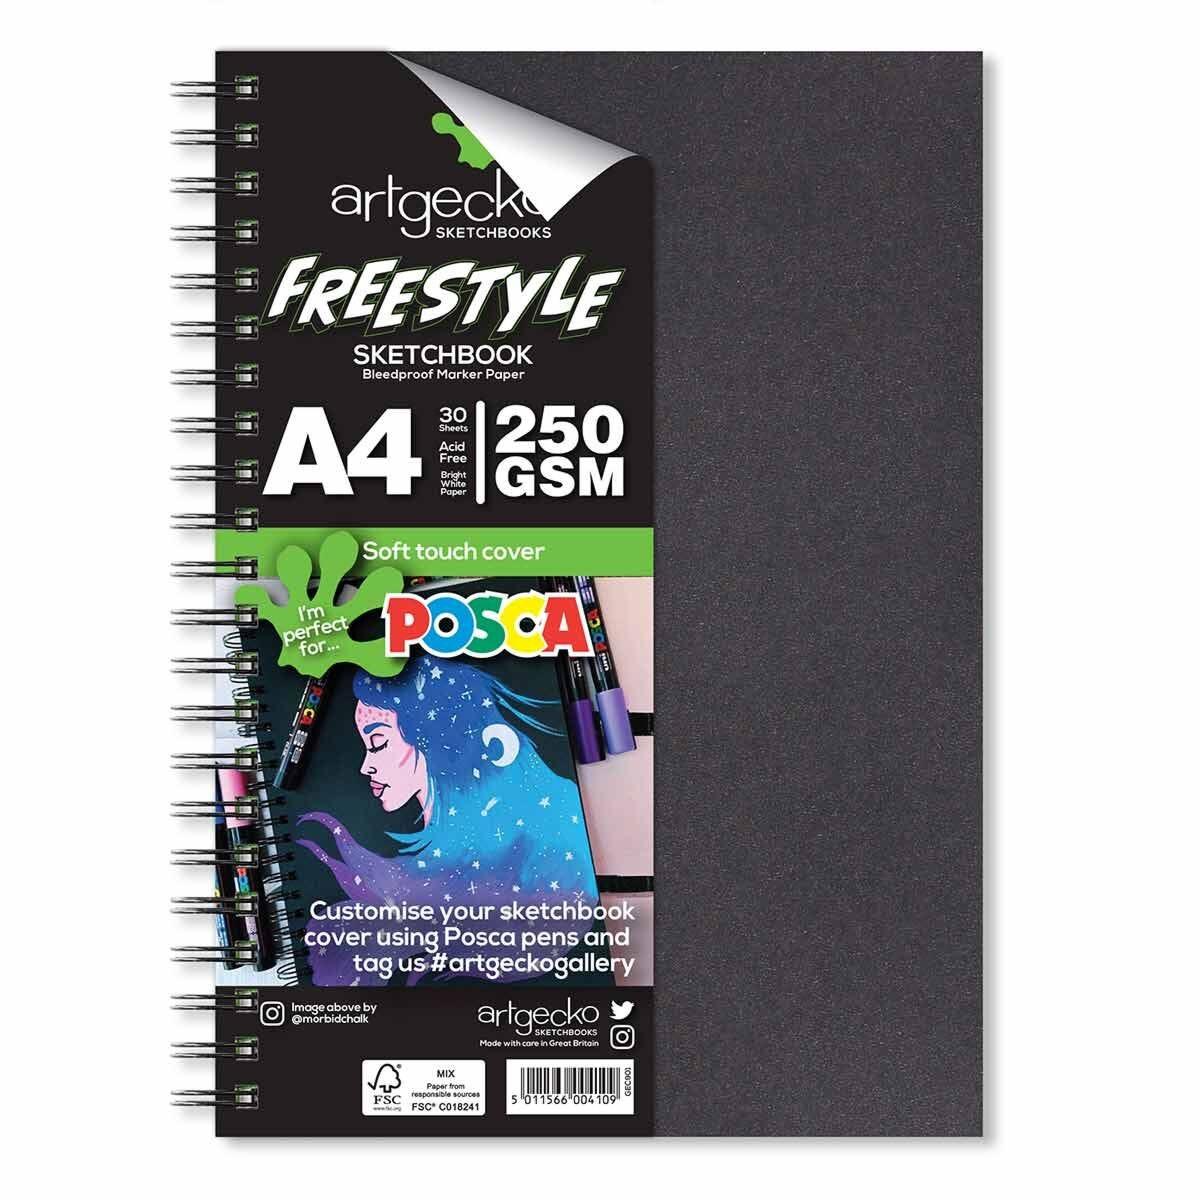 Artgecko Freestyle Sketchbook A4 250gsm